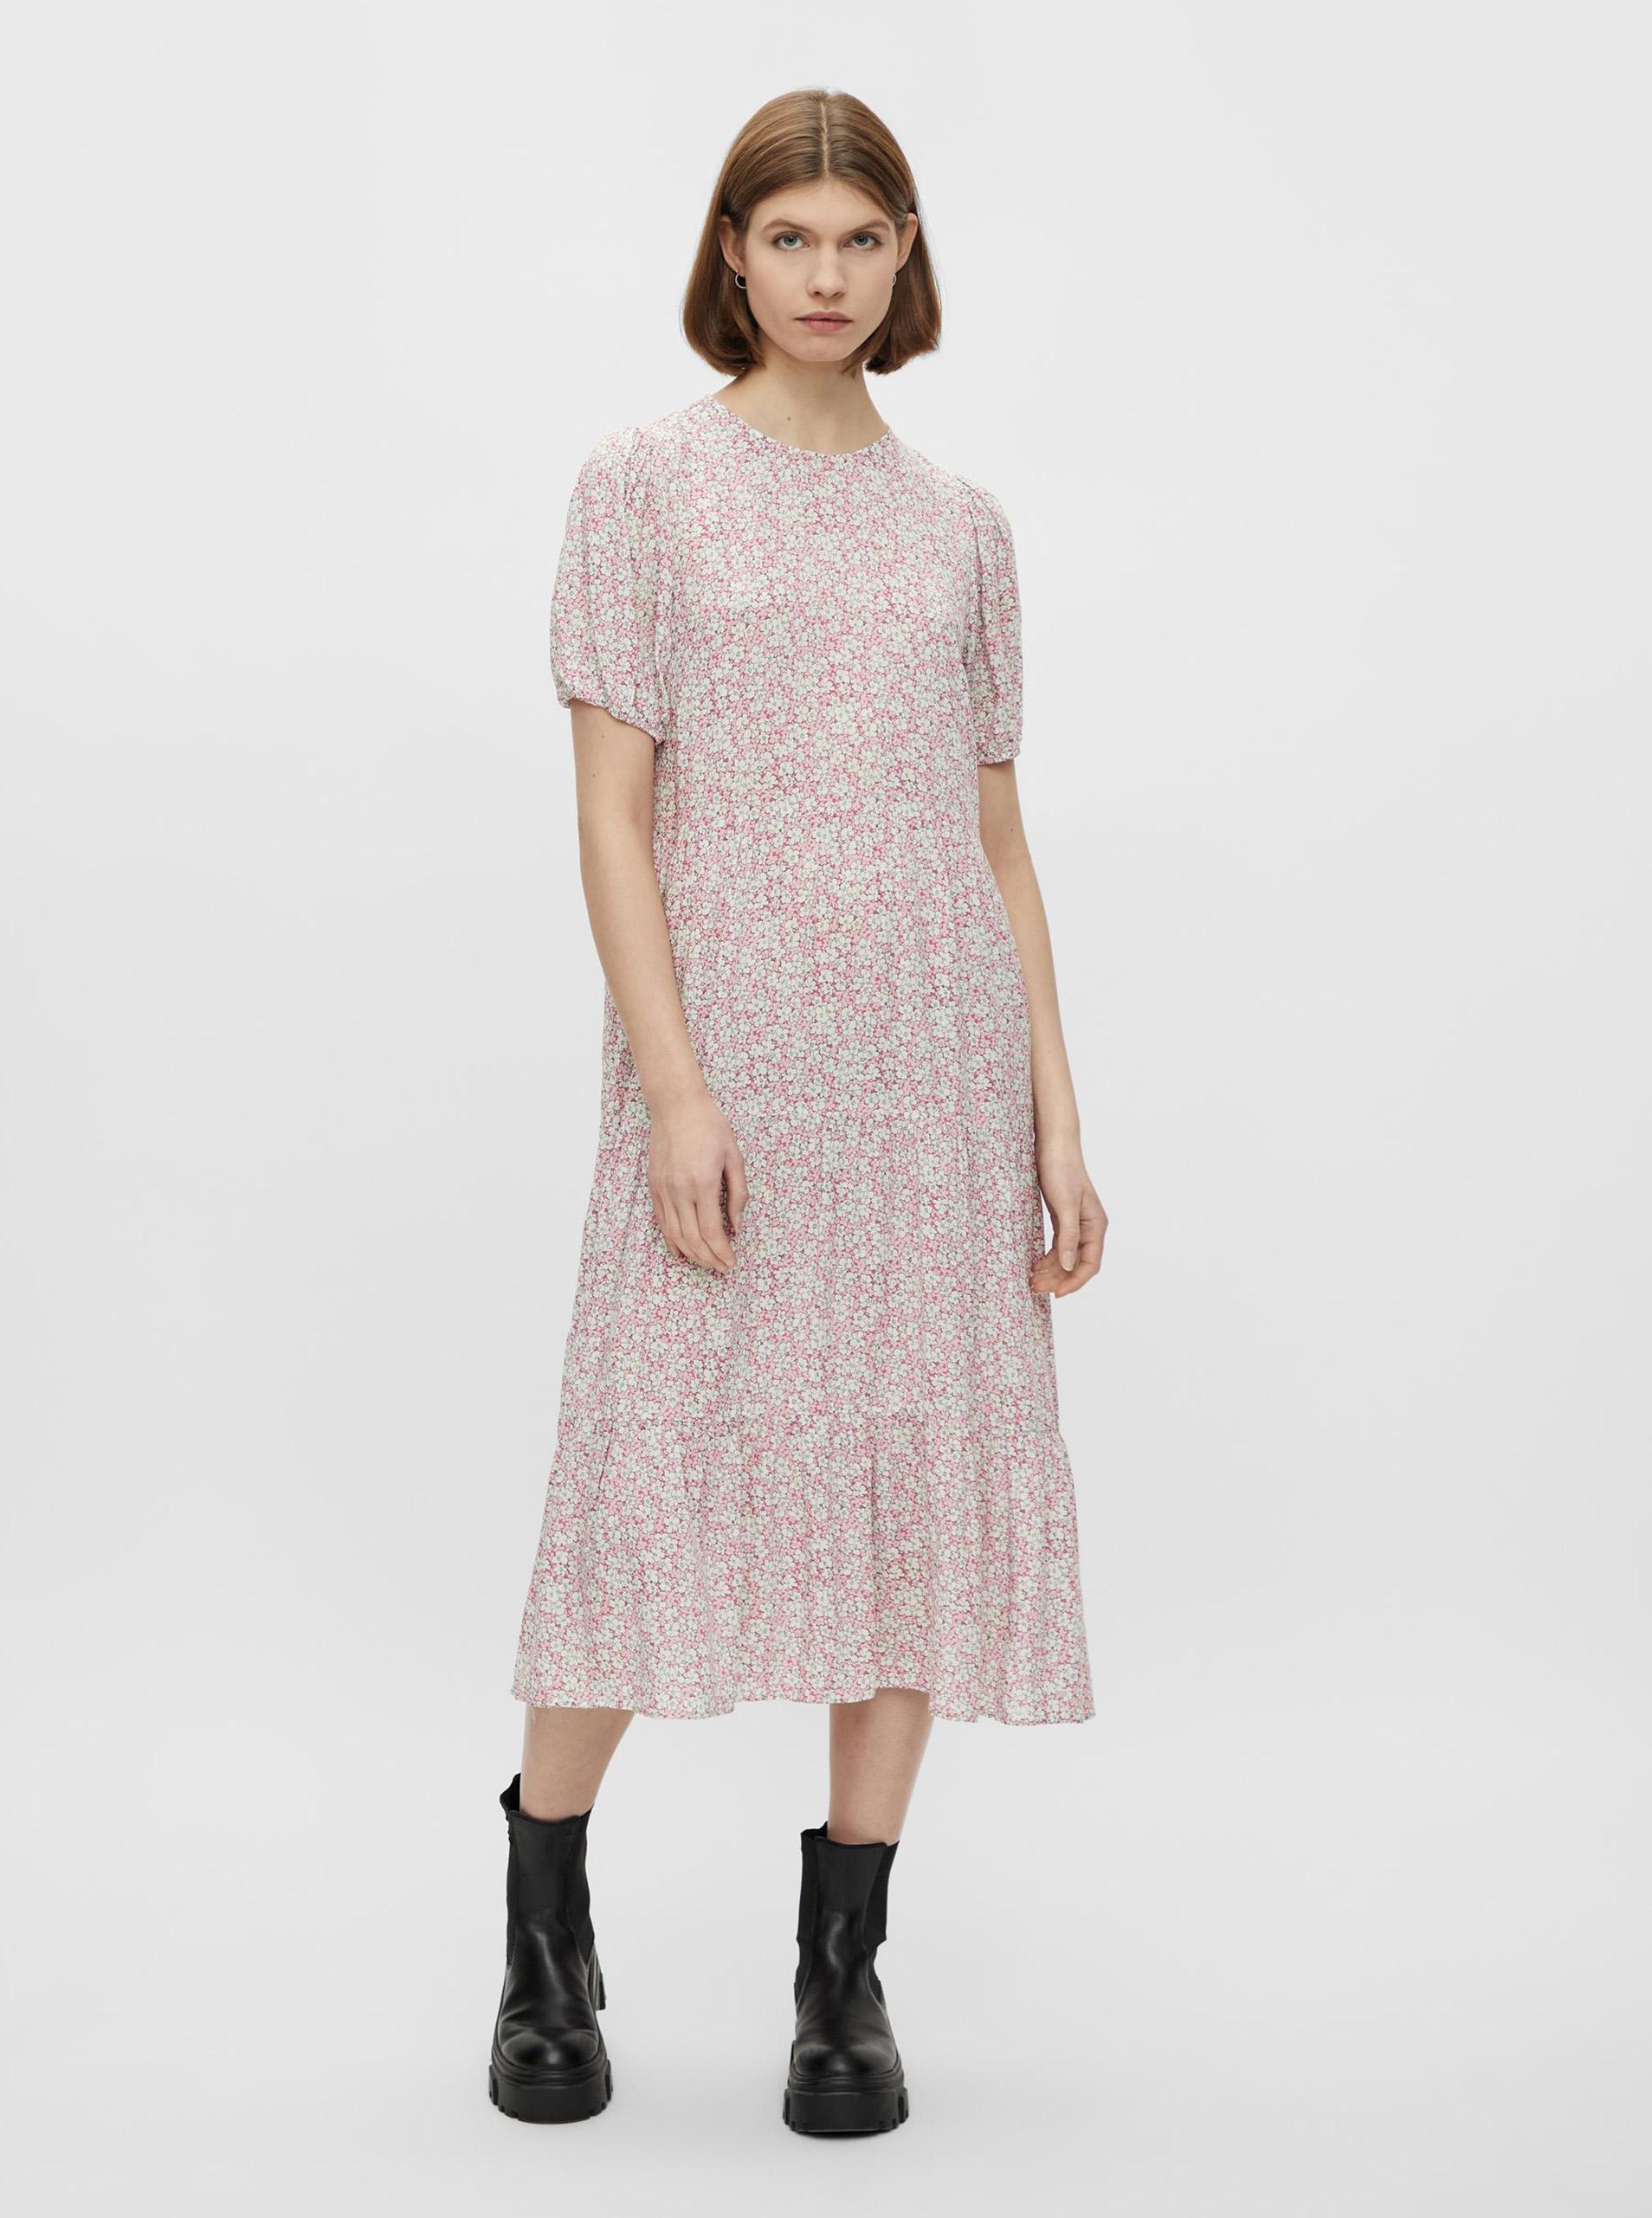 Pieces pink midi flowered dress Anneline